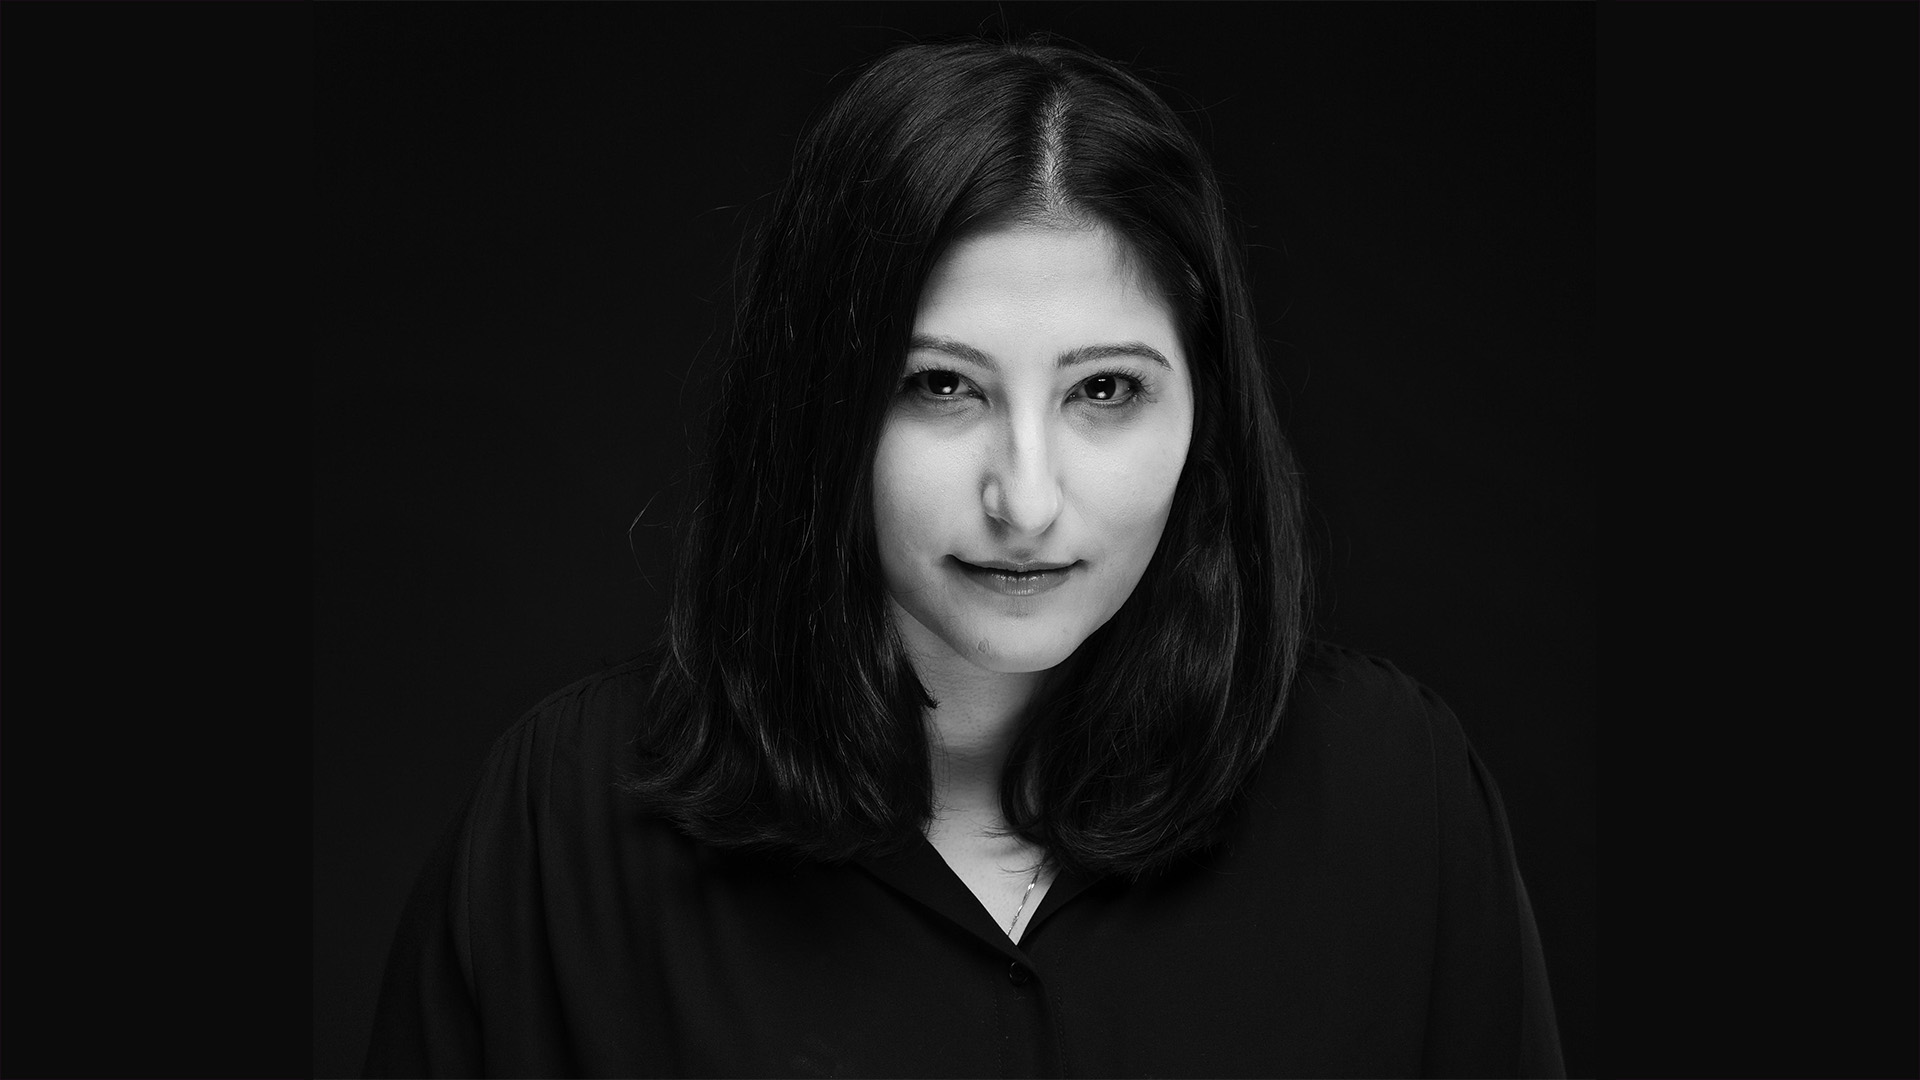 Nona Khodai